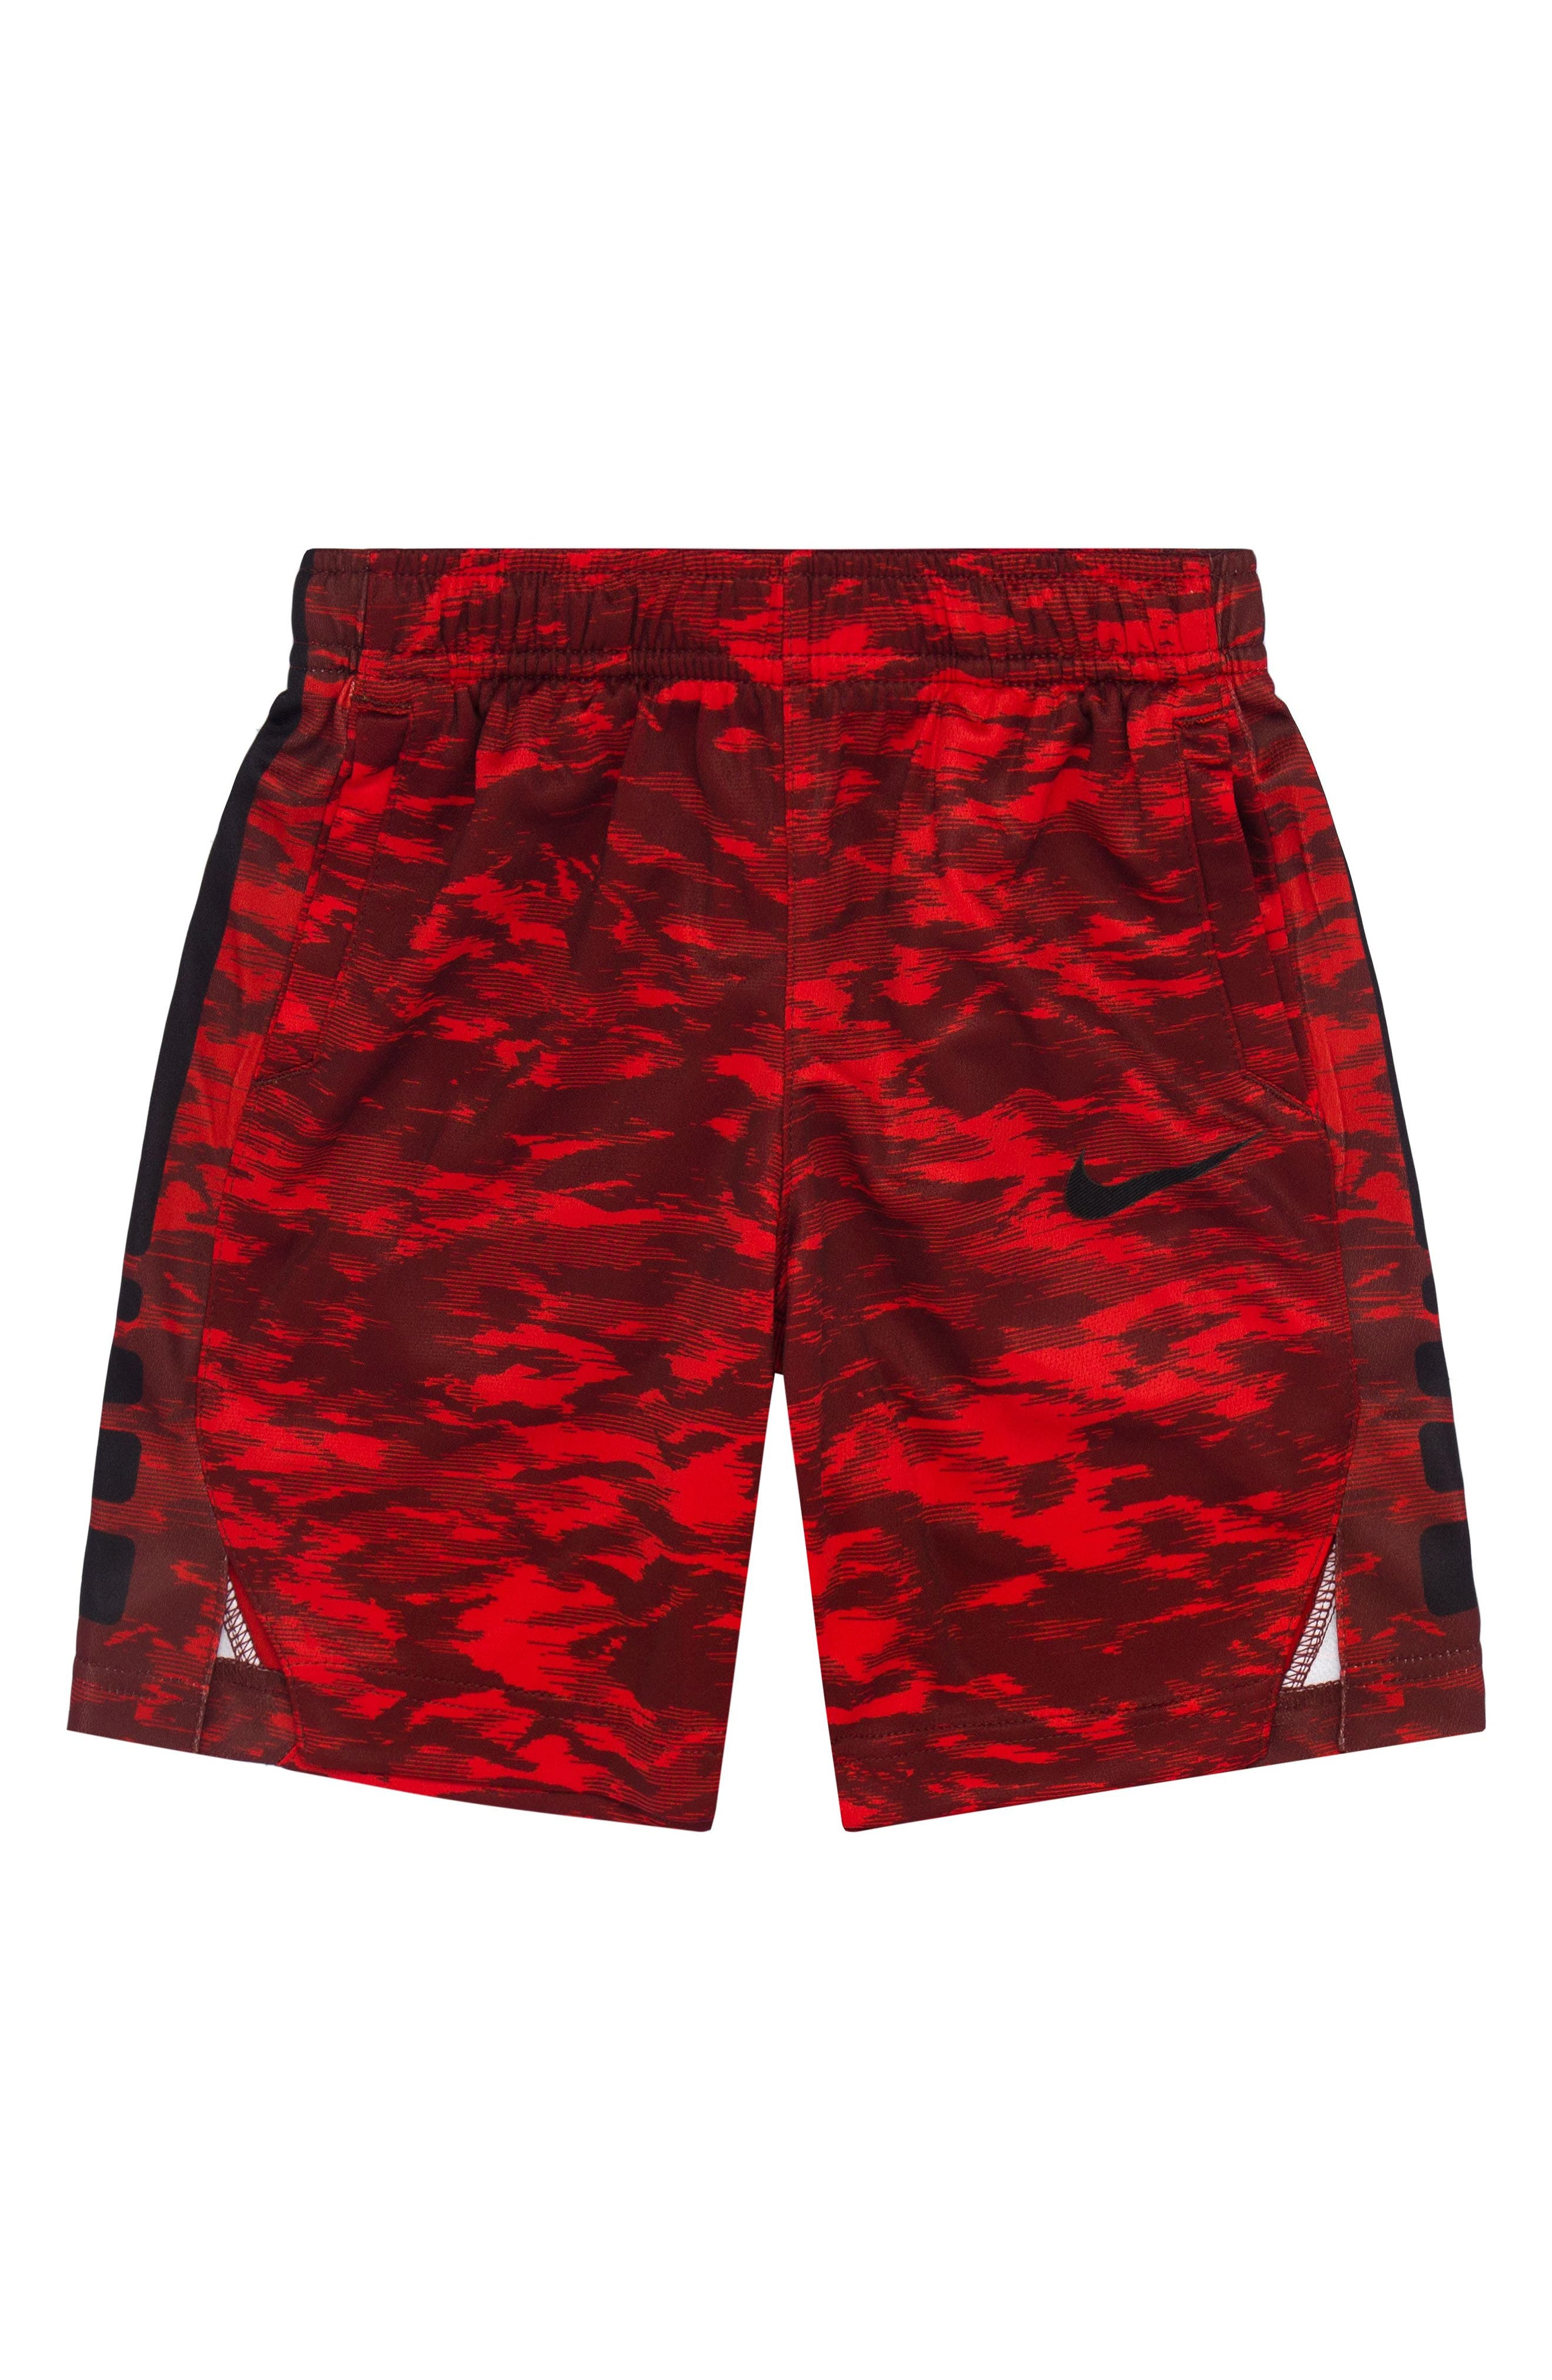 Nike Vent AOP Shorts (Toddler Boys & Little Boys)